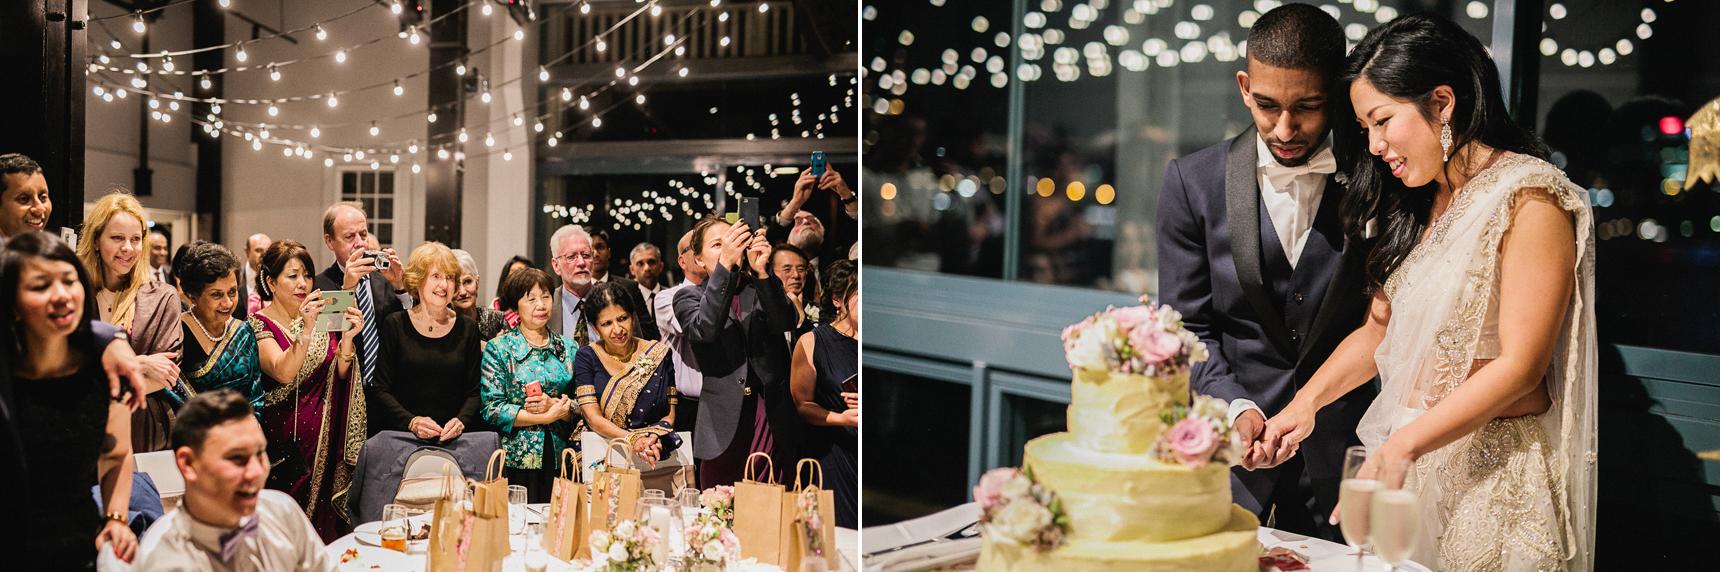 MJ_Pier_One_Sydney_Wedding_Photographer063.jpg